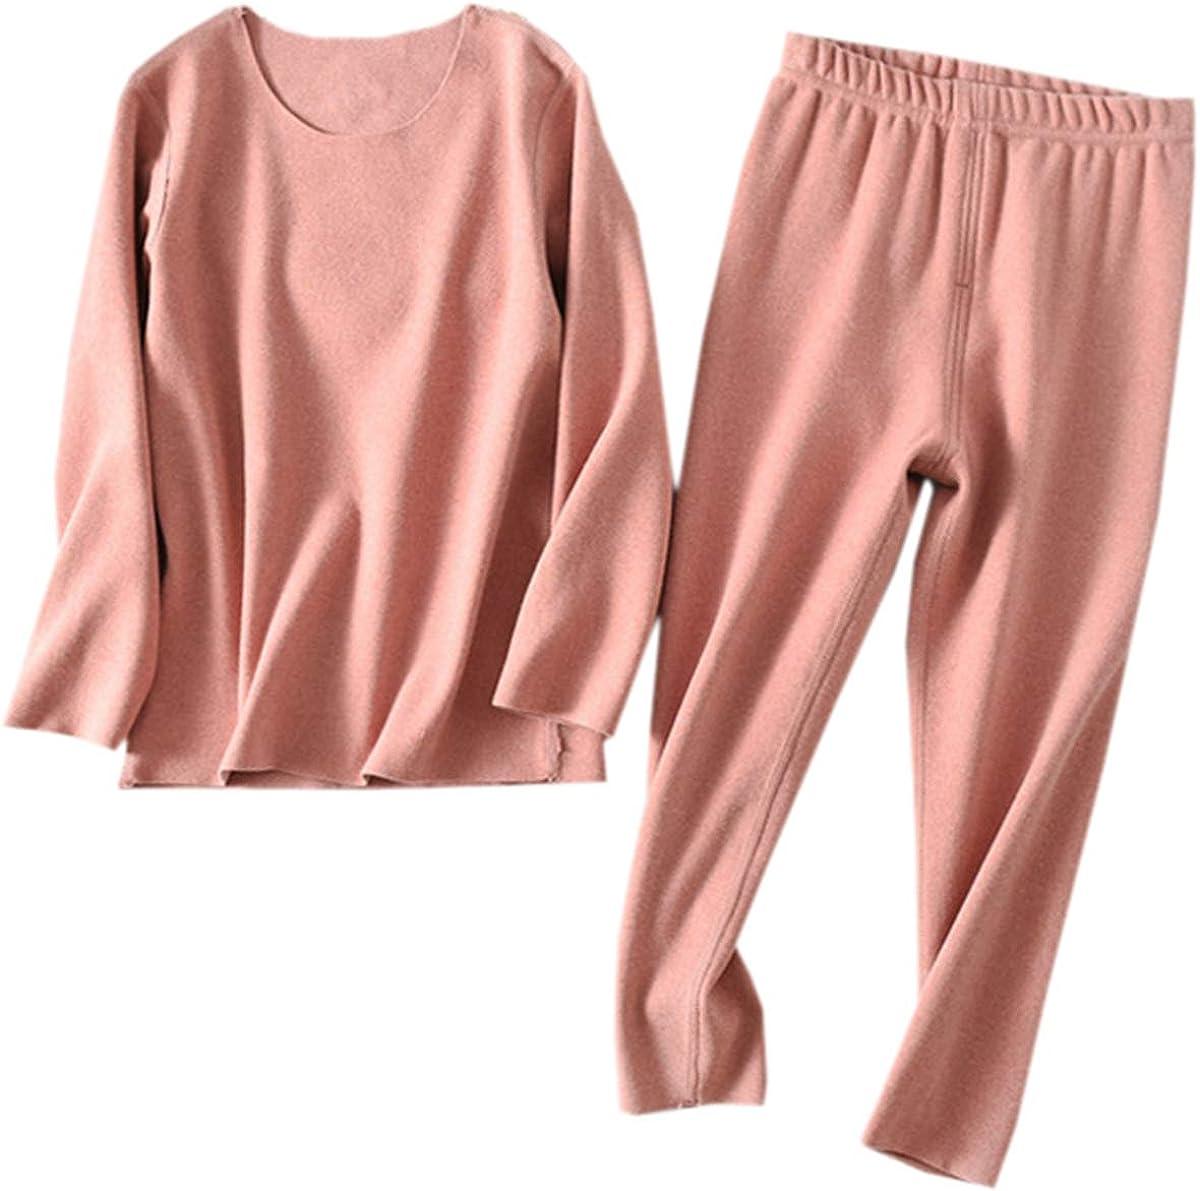 Kids Girls Pajamas Set, Solid Color Soft Thermal Long Sleeve Pullover T-Shirt Tops + Matching Pants Sleepwear Loungewear Pajamas Set, Solid Pink, 18-24 Months = Tag 100